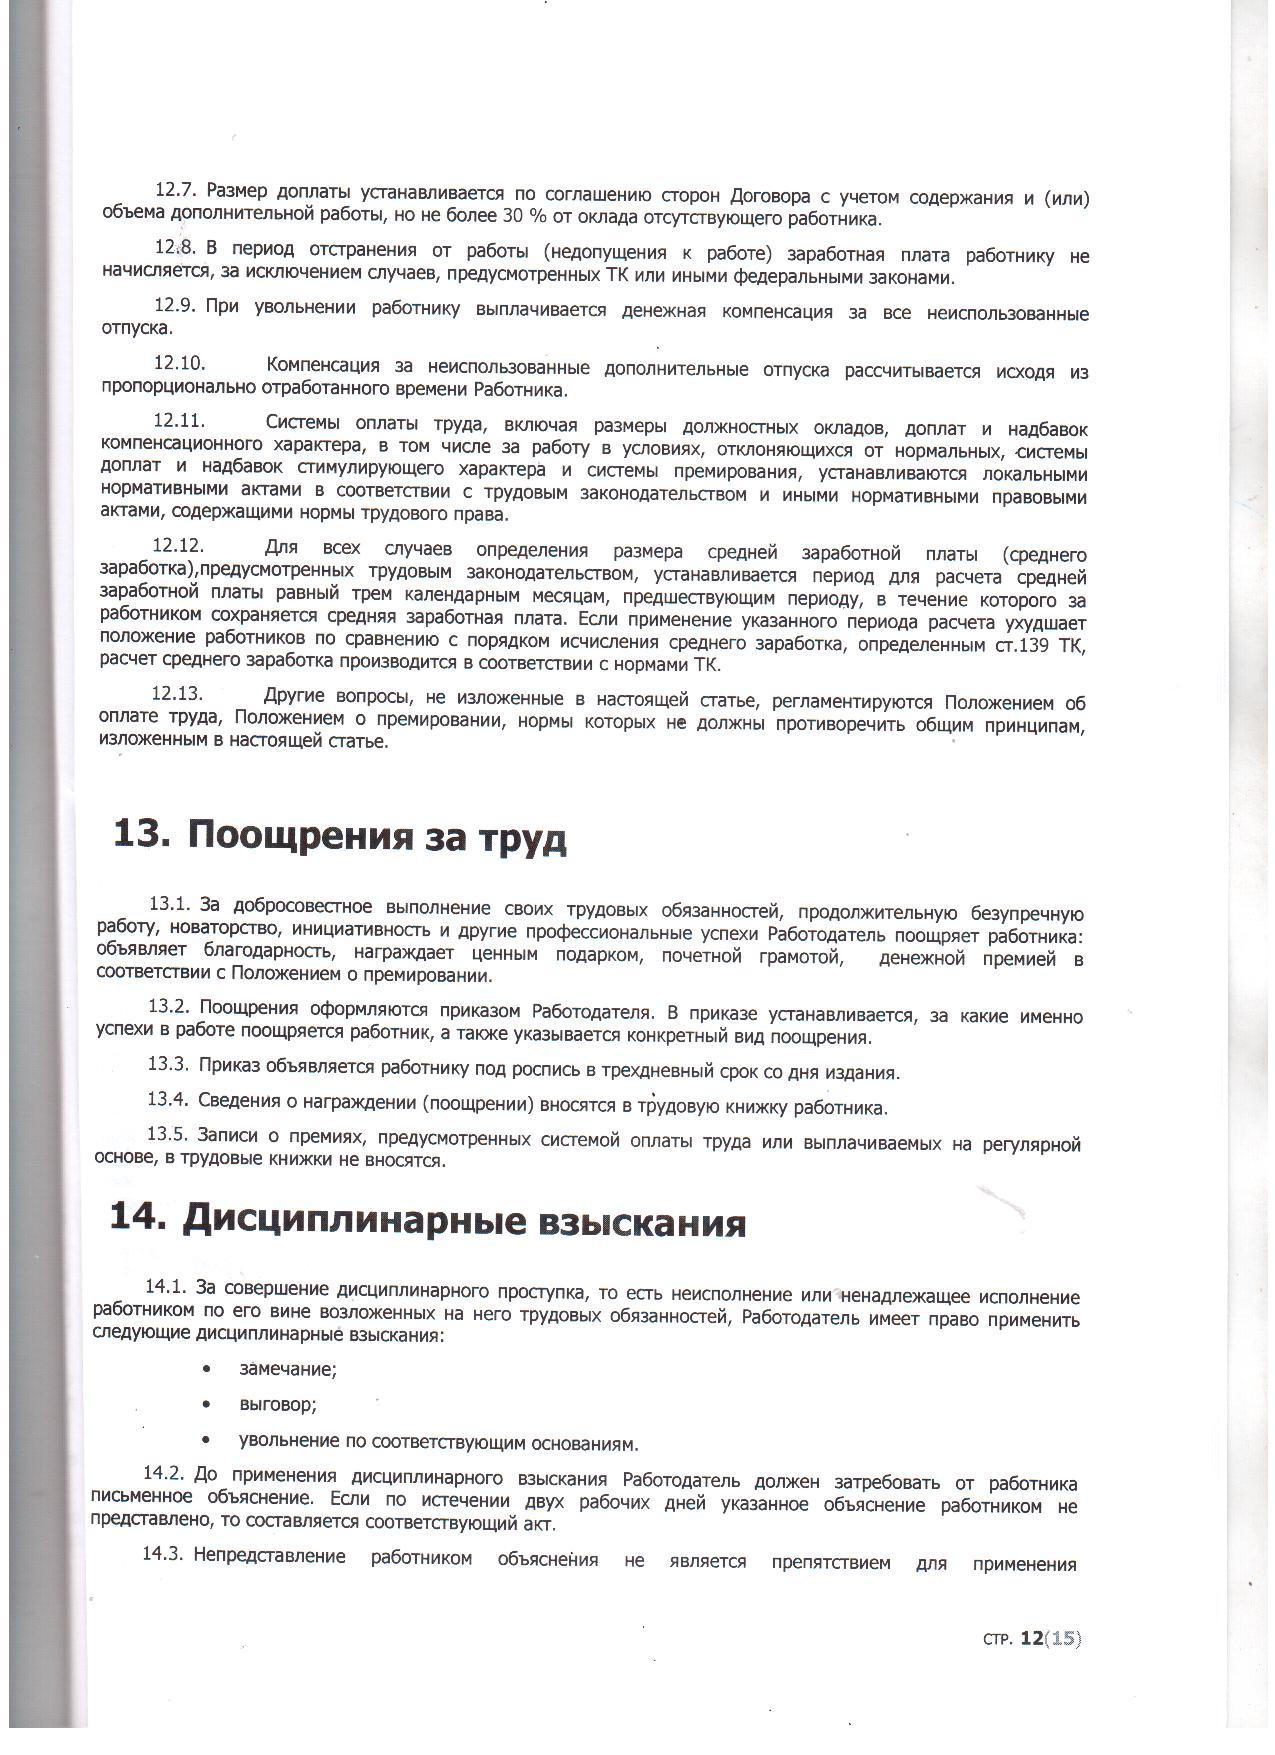 Правила внутреннего трудоговоро распорядка 12